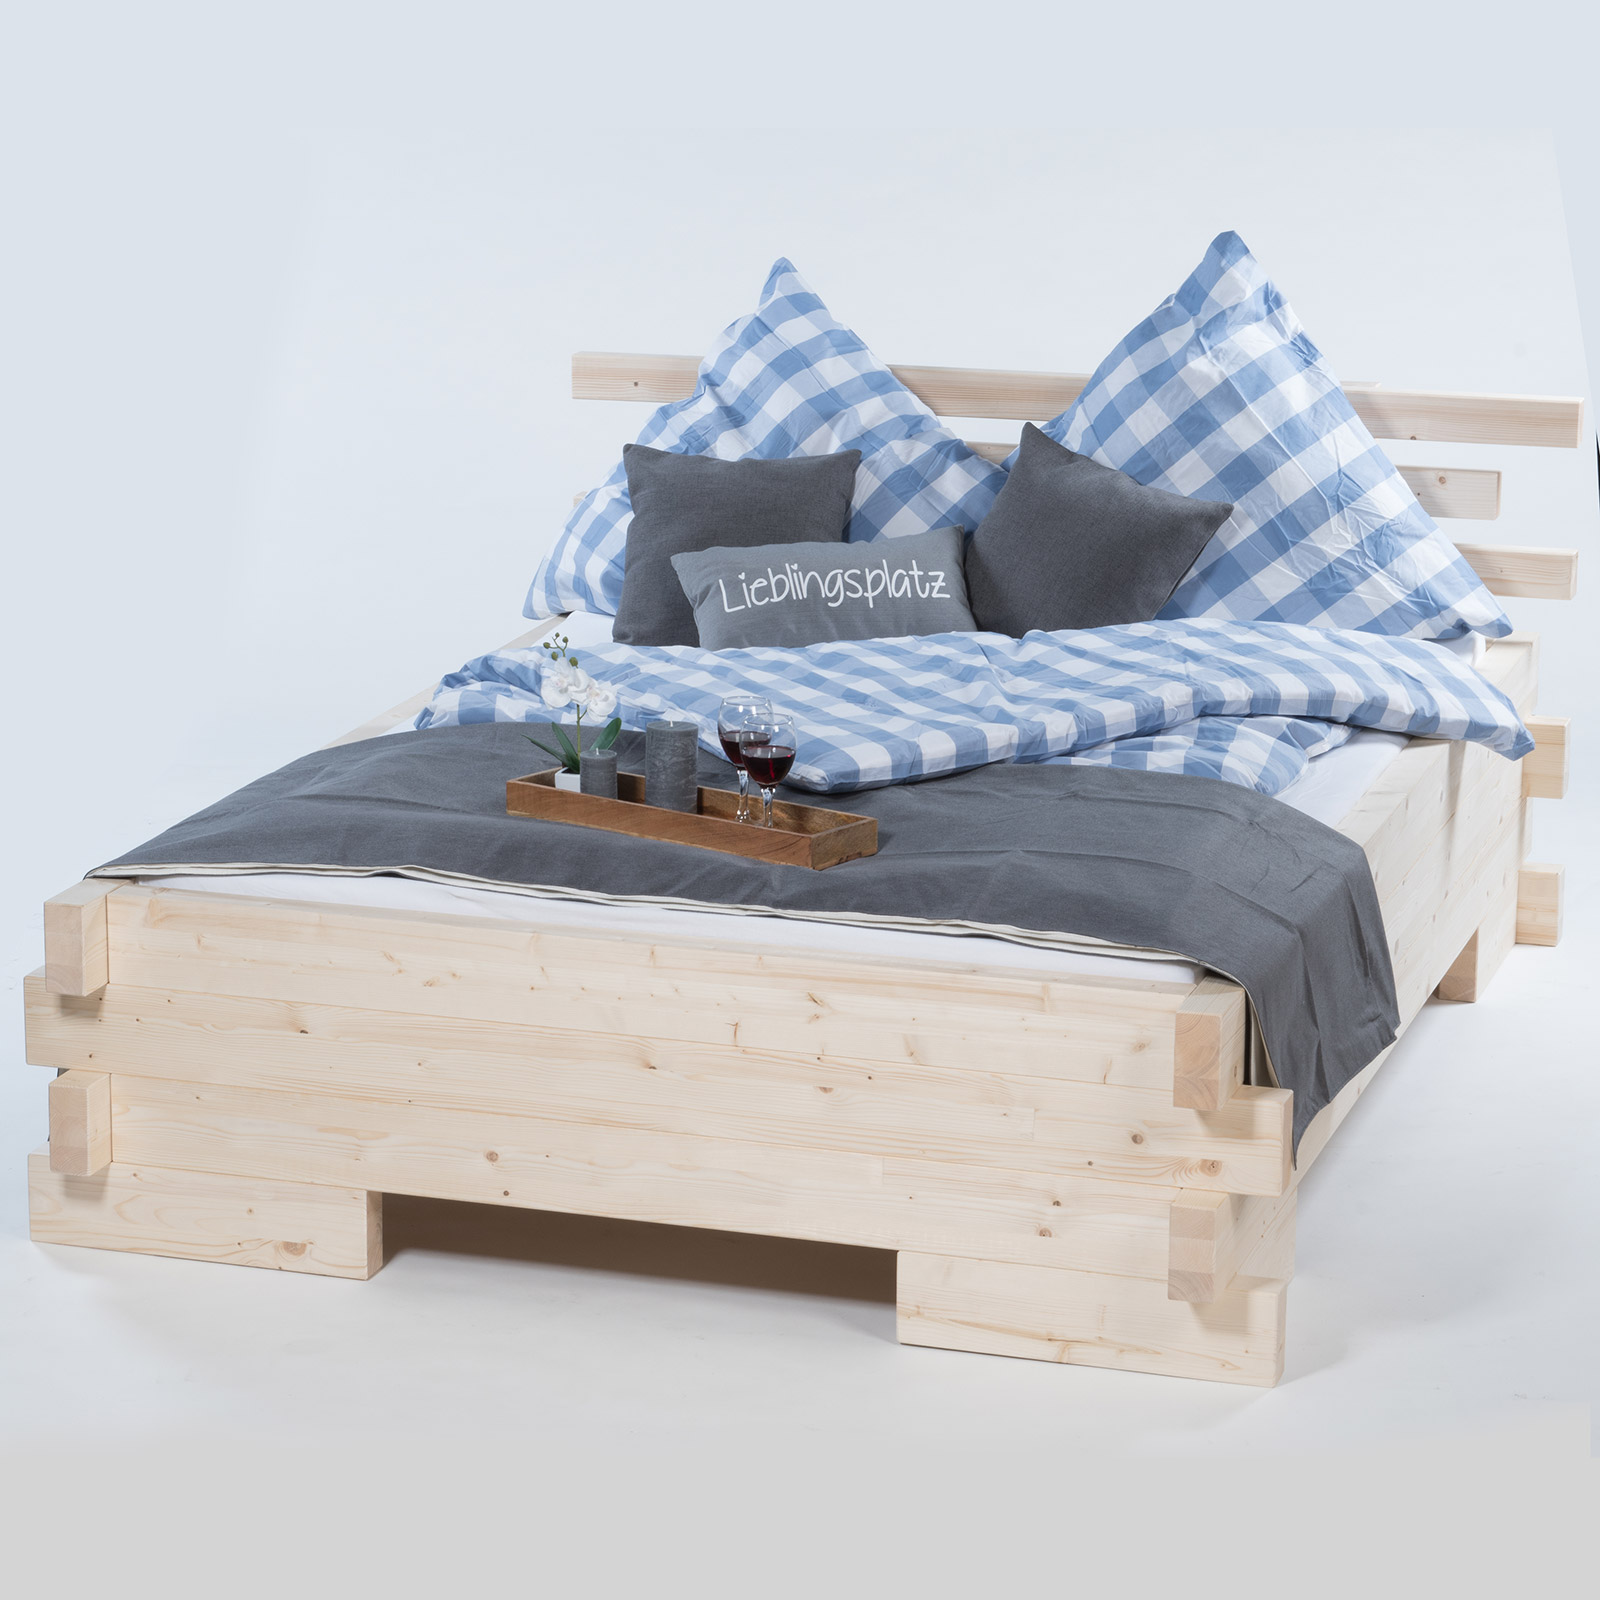 balkenbett massivholzbett daybett boxspringbett 90 120 140 160 180 200 x 200 220 ebay. Black Bedroom Furniture Sets. Home Design Ideas